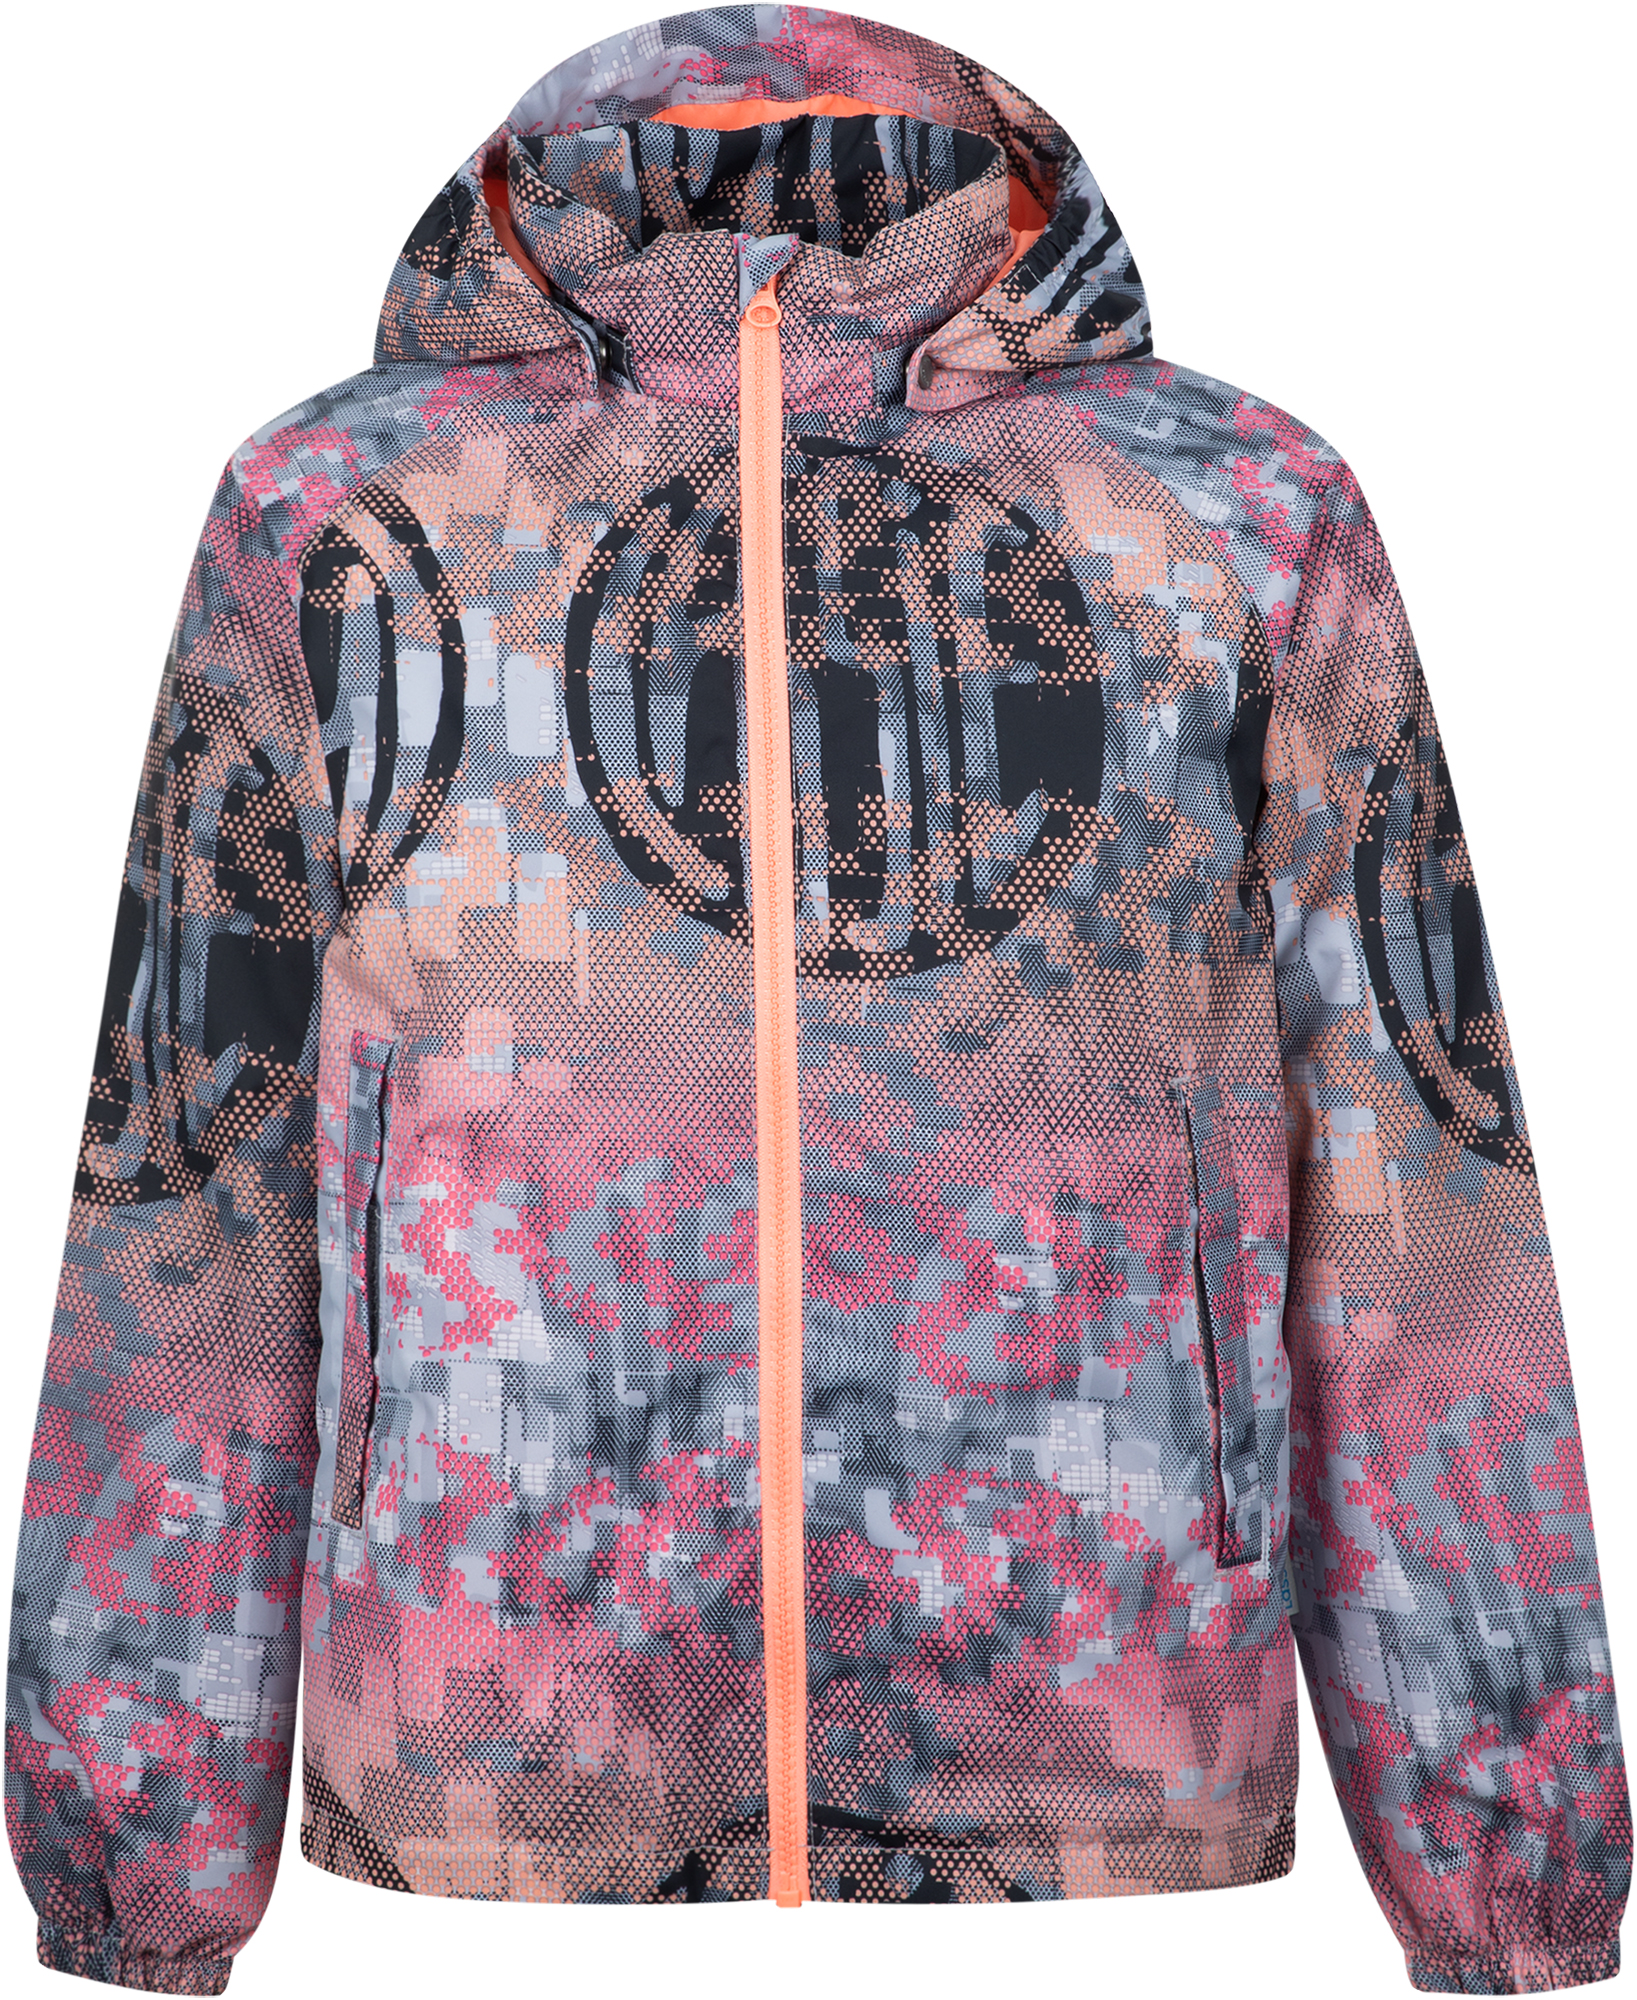 цена на Lassie Куртка утепленная для девочек LASSIE Kaspian, размер 134